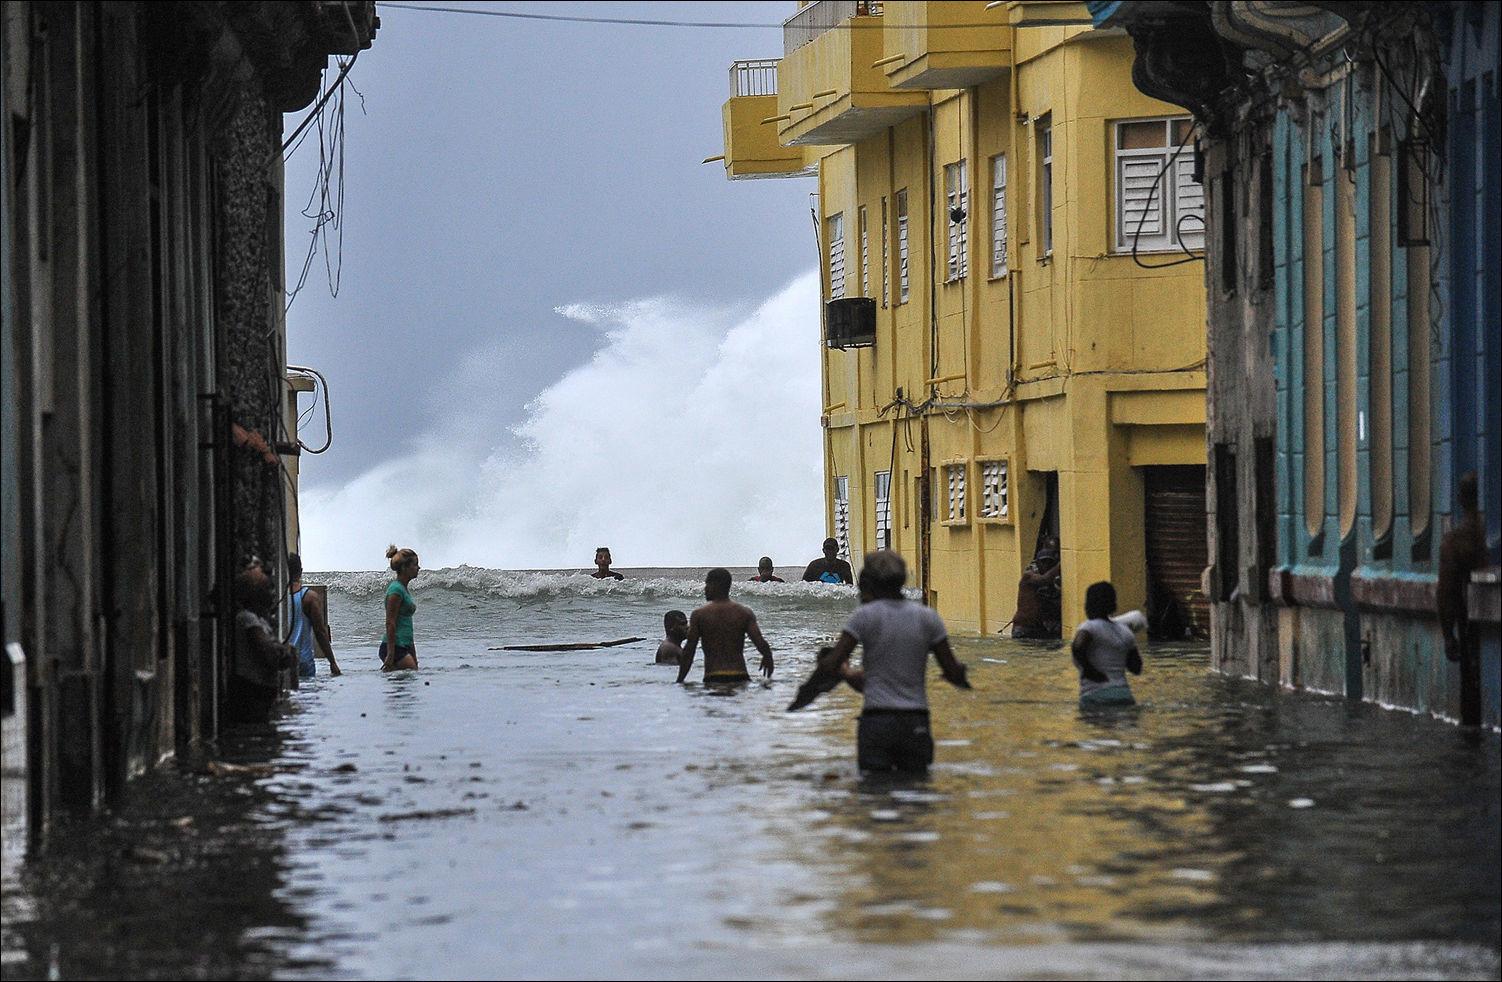 вас фото варадеро после урагана ирма подсознание может